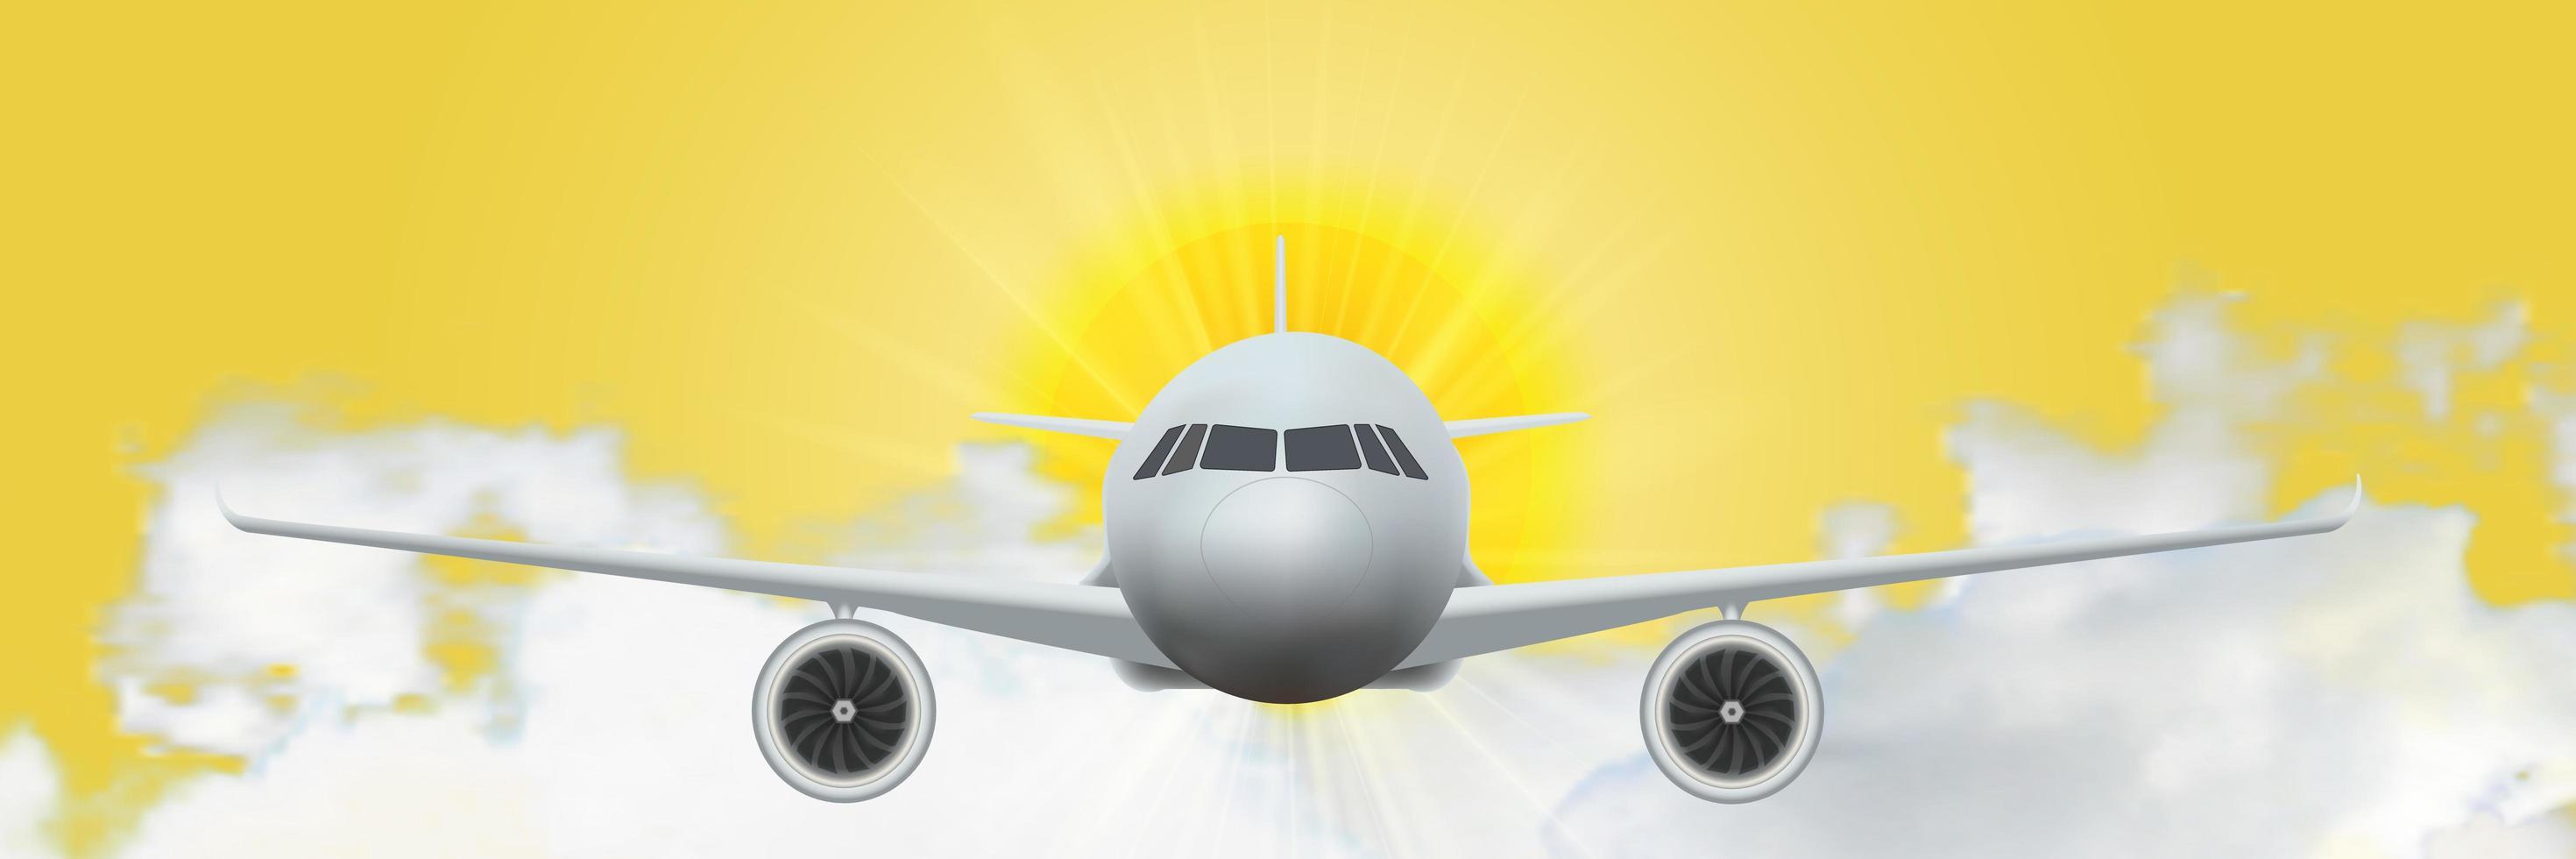 Flugzeuge bei Sonnenaufgang vektor